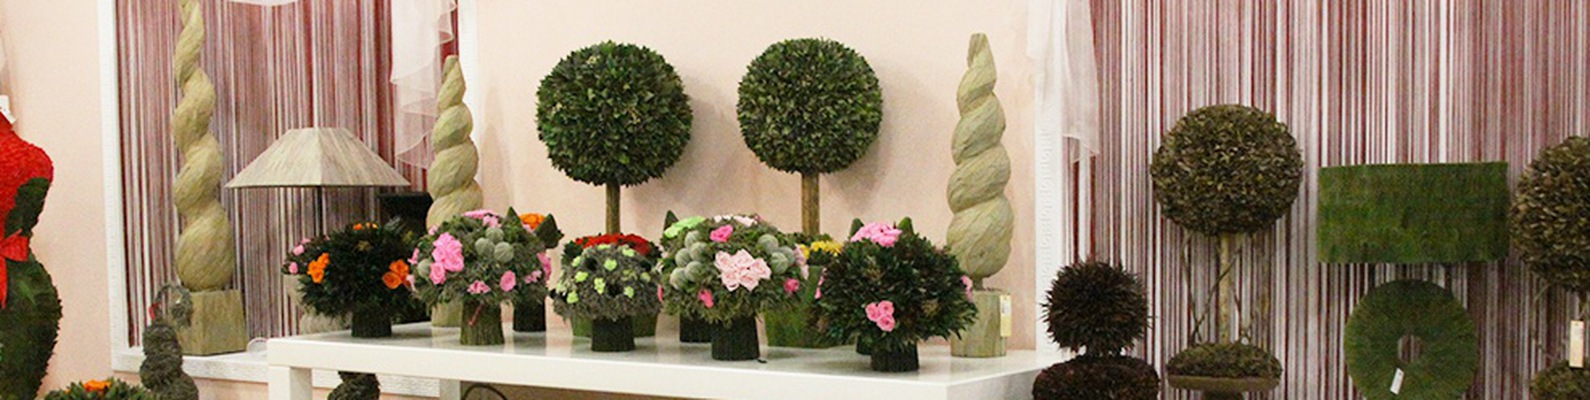 Магазин цветов афимолл